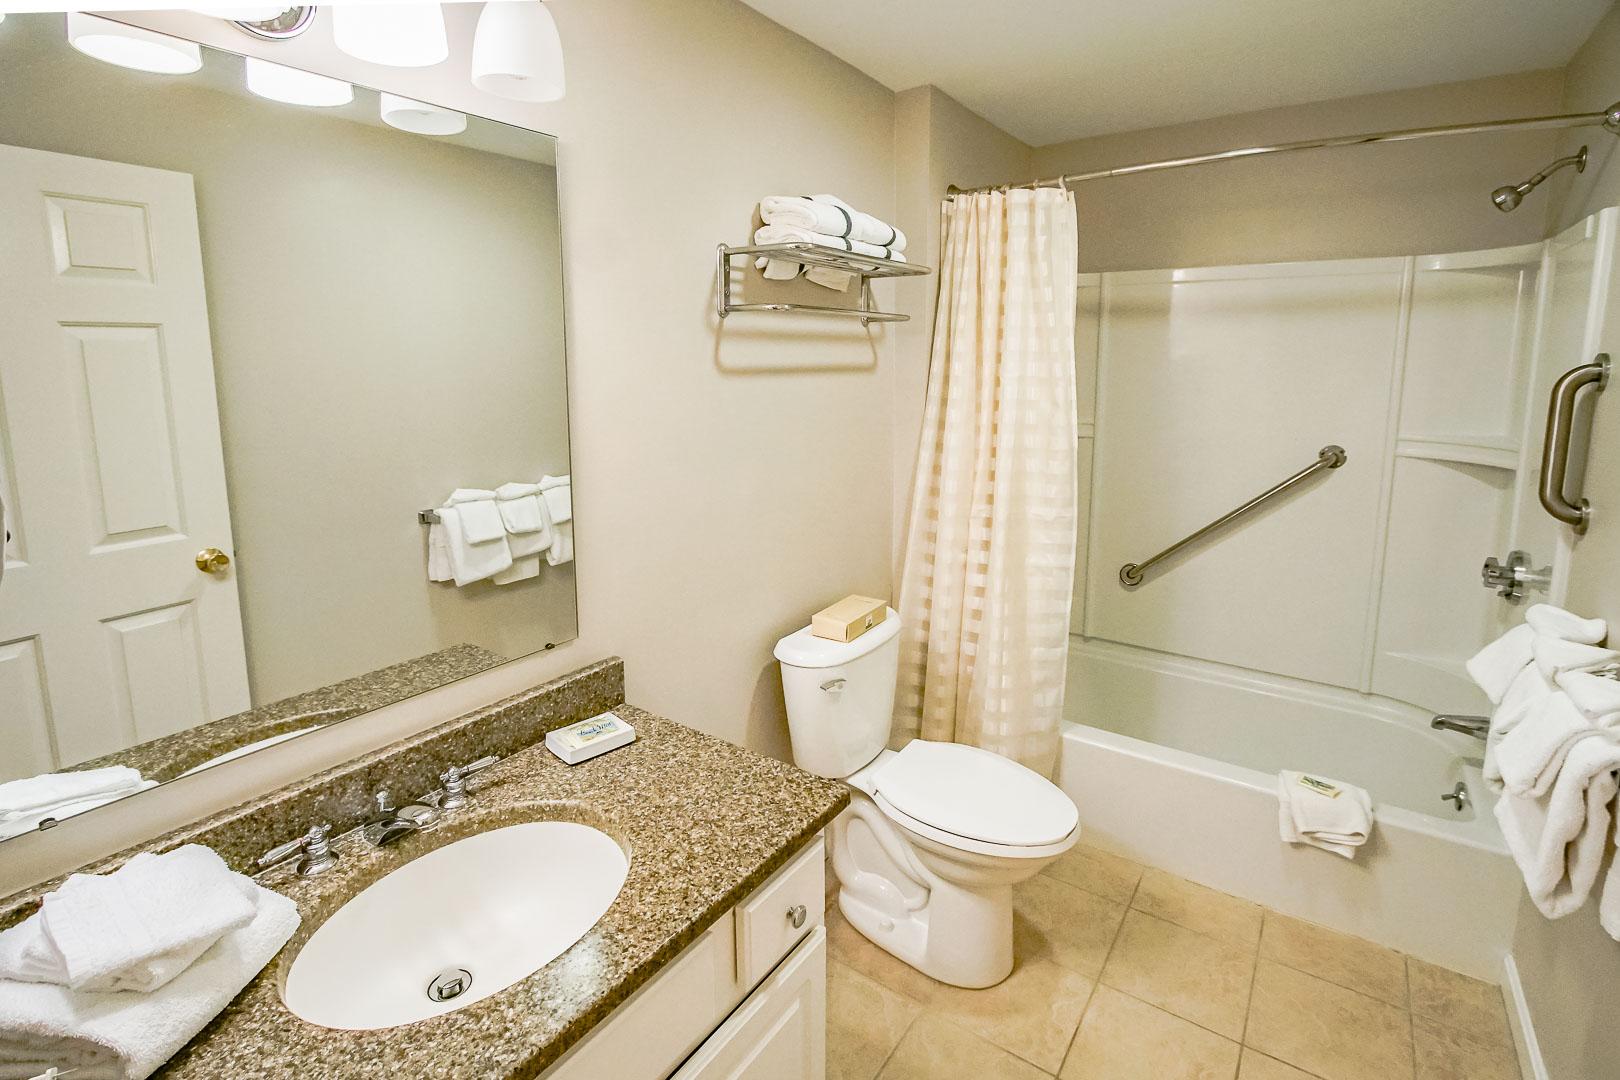 A clean bathroom room at VRI's Sea Mist Resort in Massachusetts.